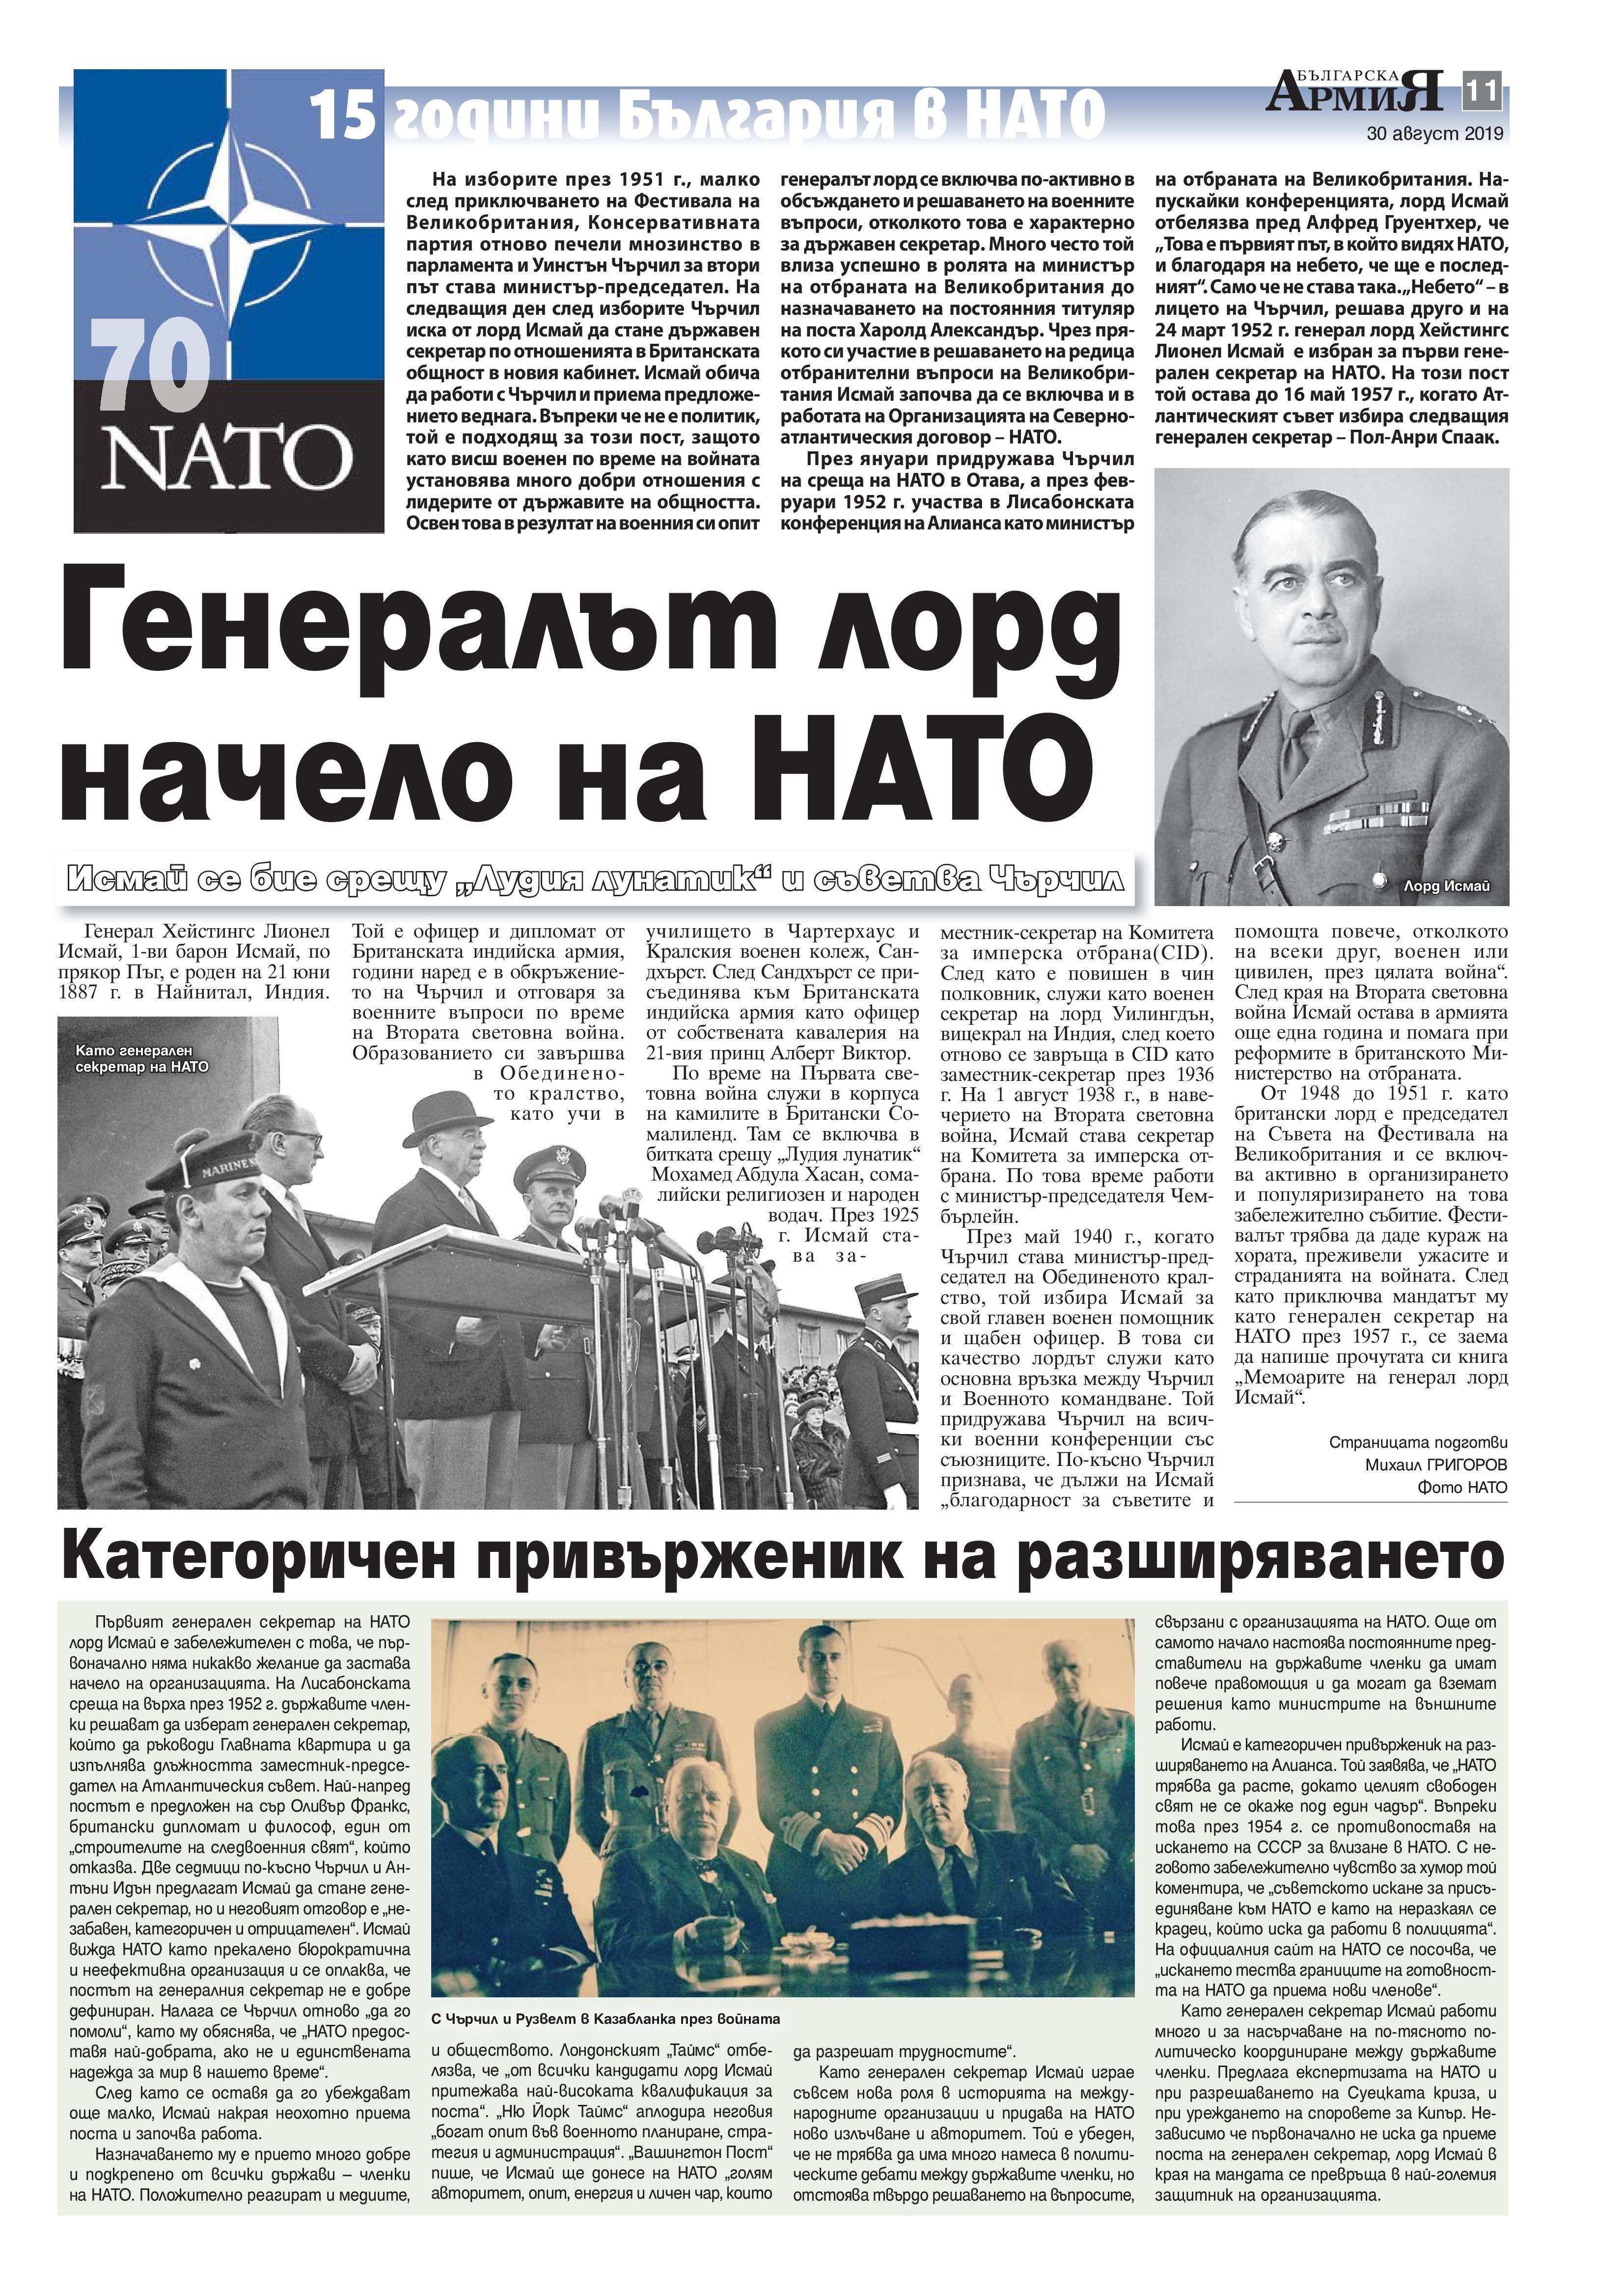 https://armymedia.bg/wp-content/uploads/2015/06/11-31.jpg